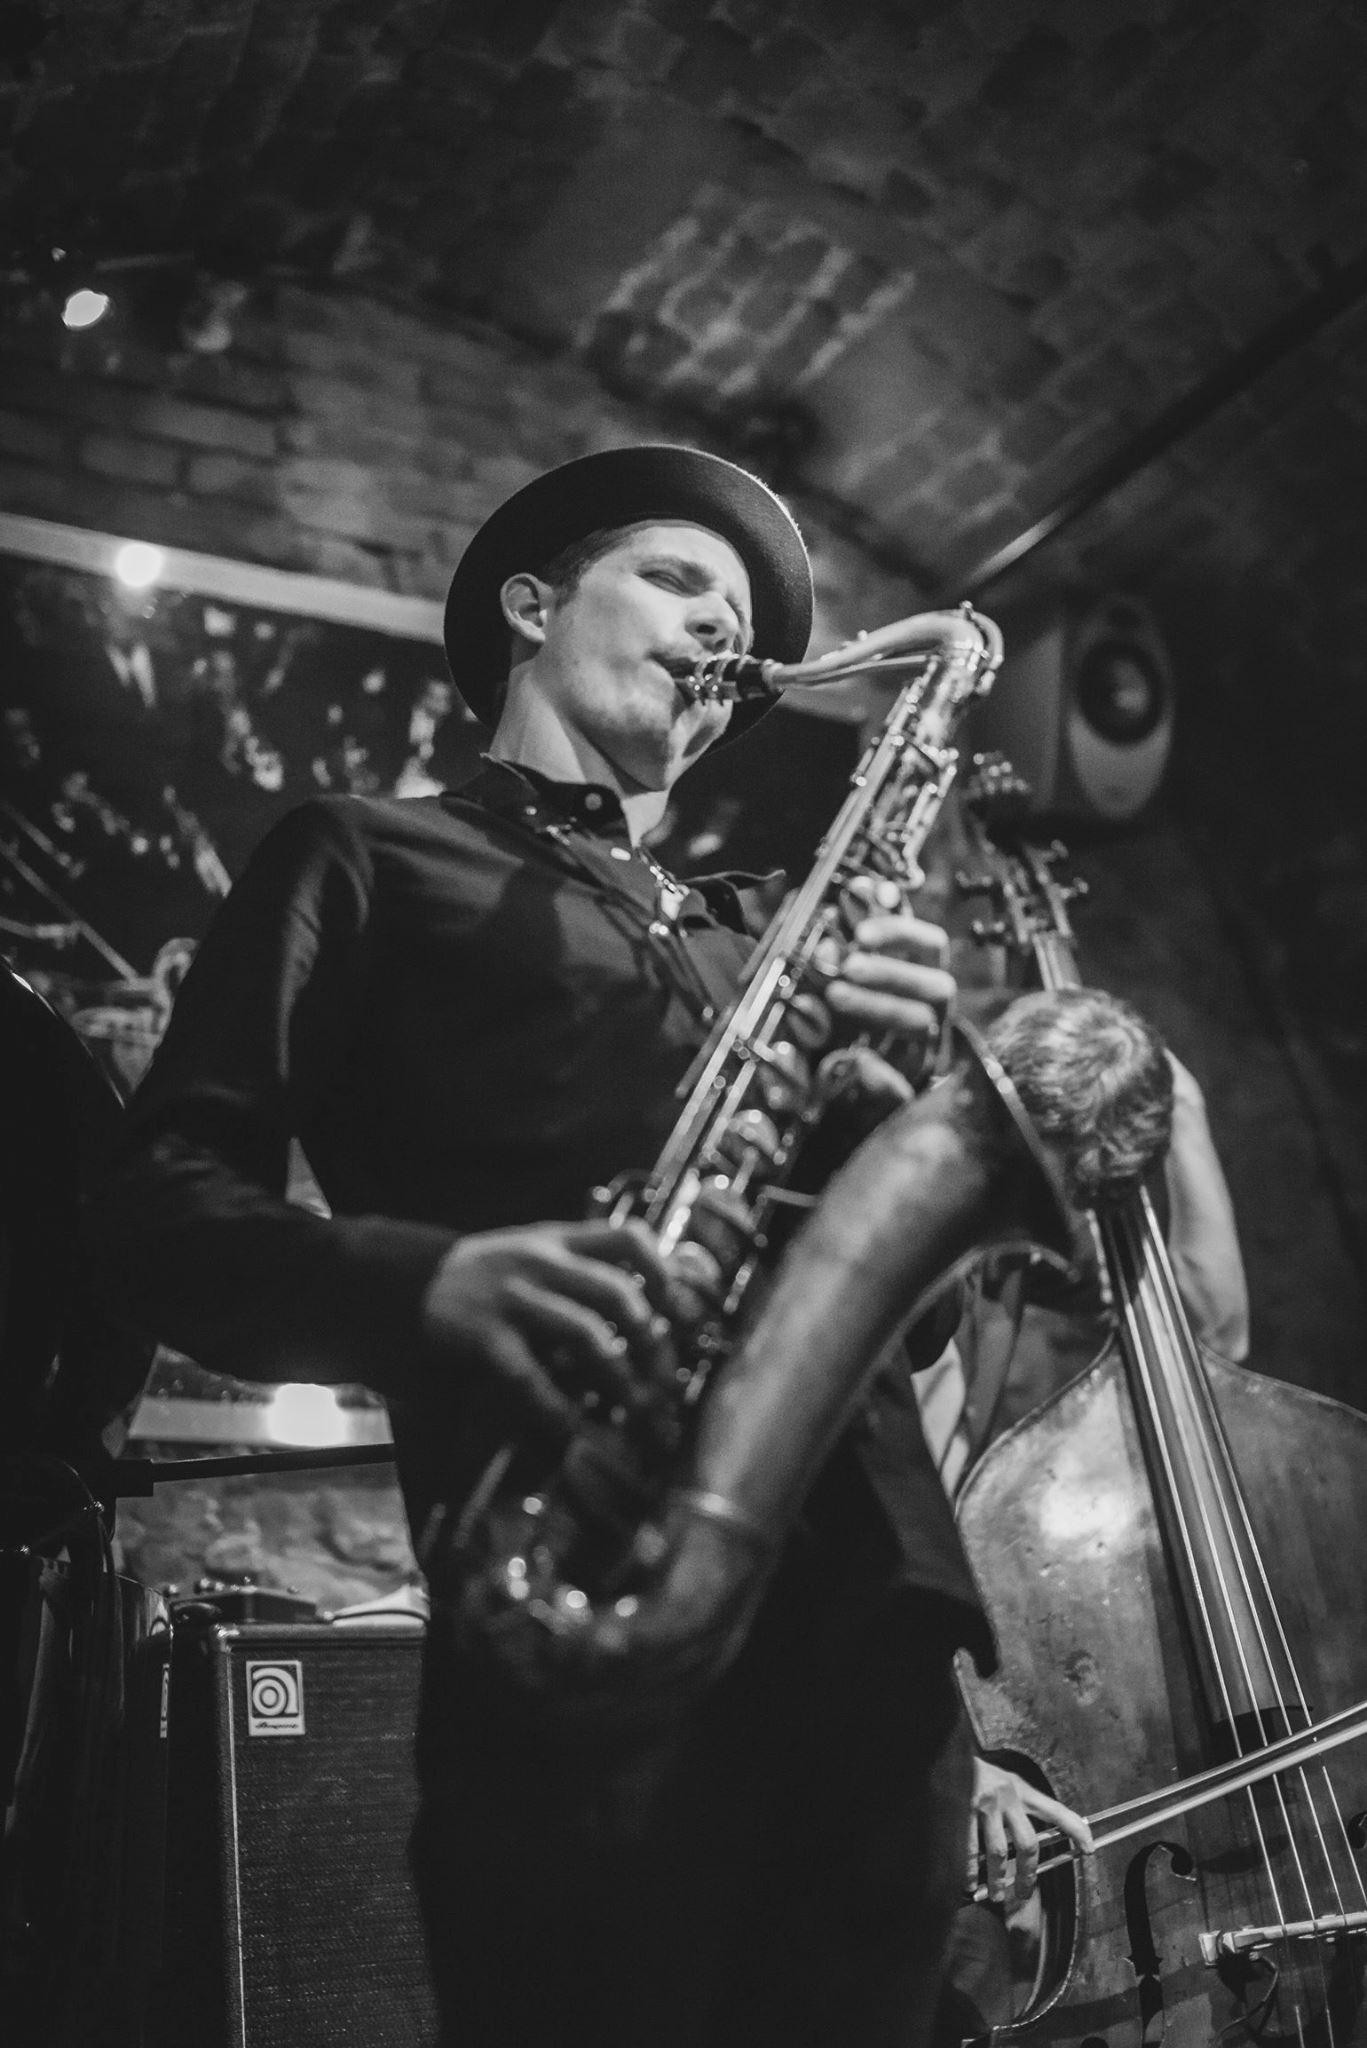 Piec'Art Jazz Club (Poland), 2.26.15